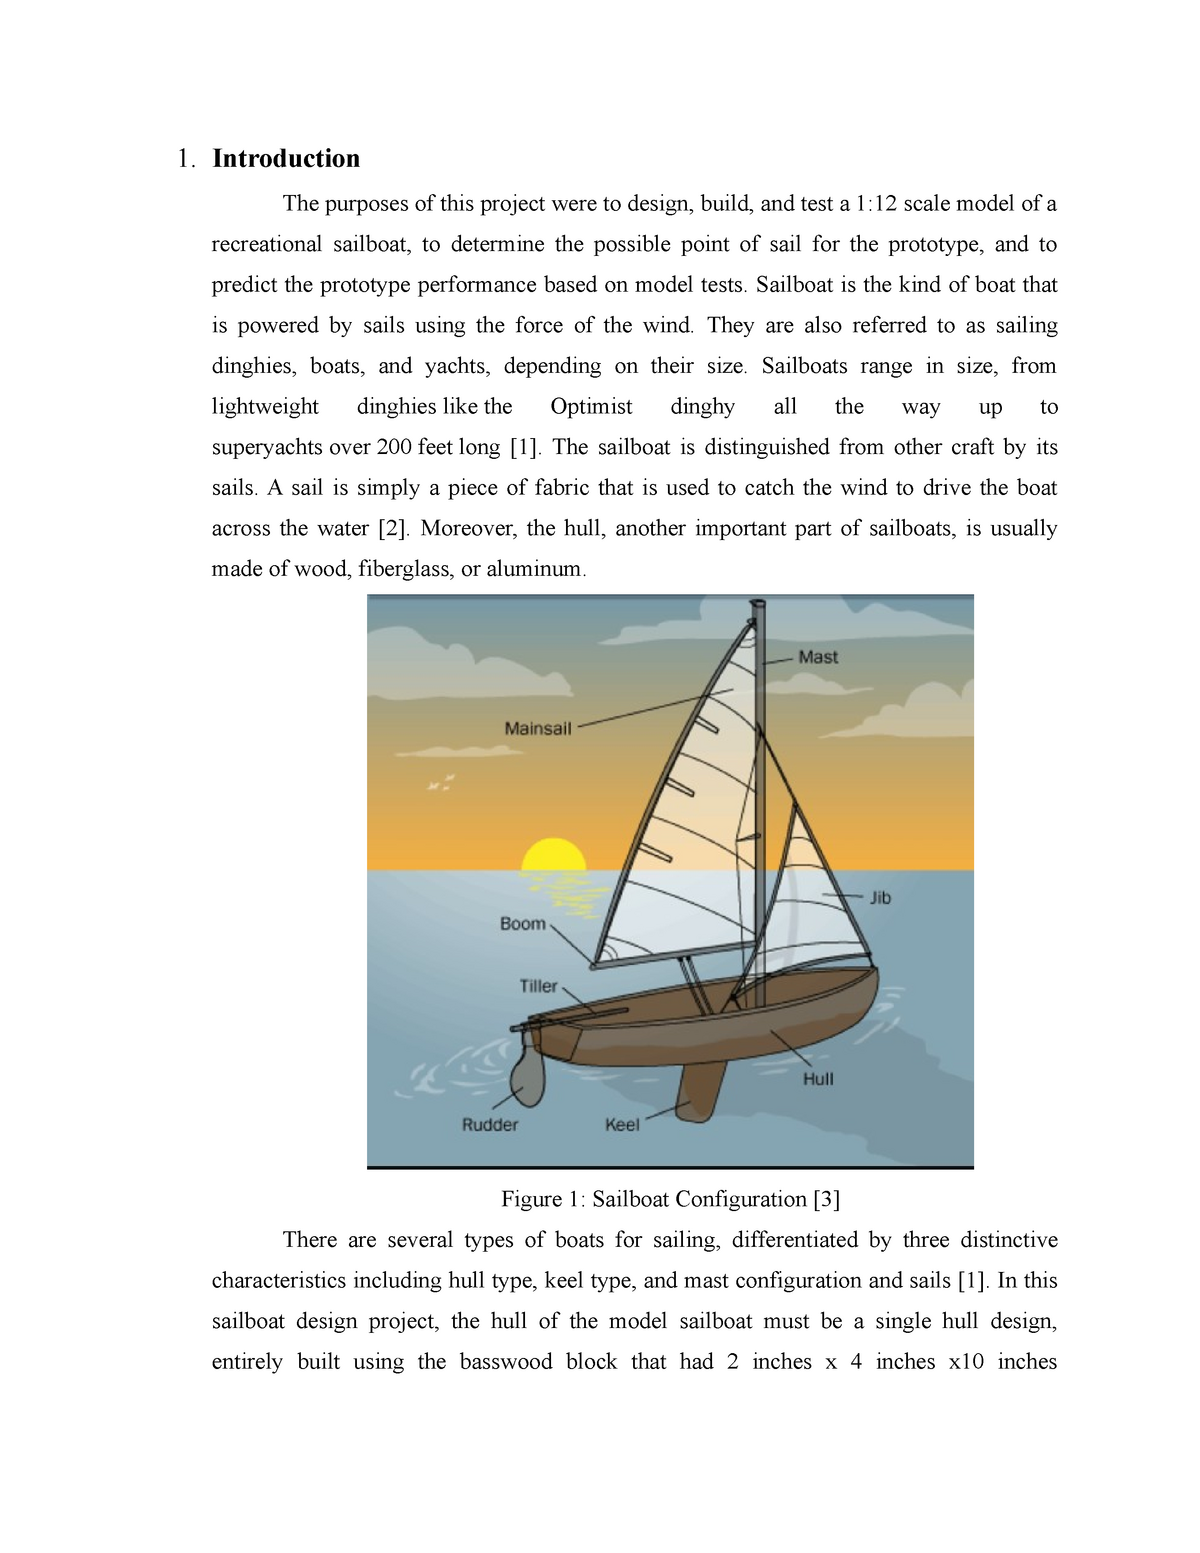 Final PROJECT EGR - EGR 490: Independent Study (W) - StuDocu